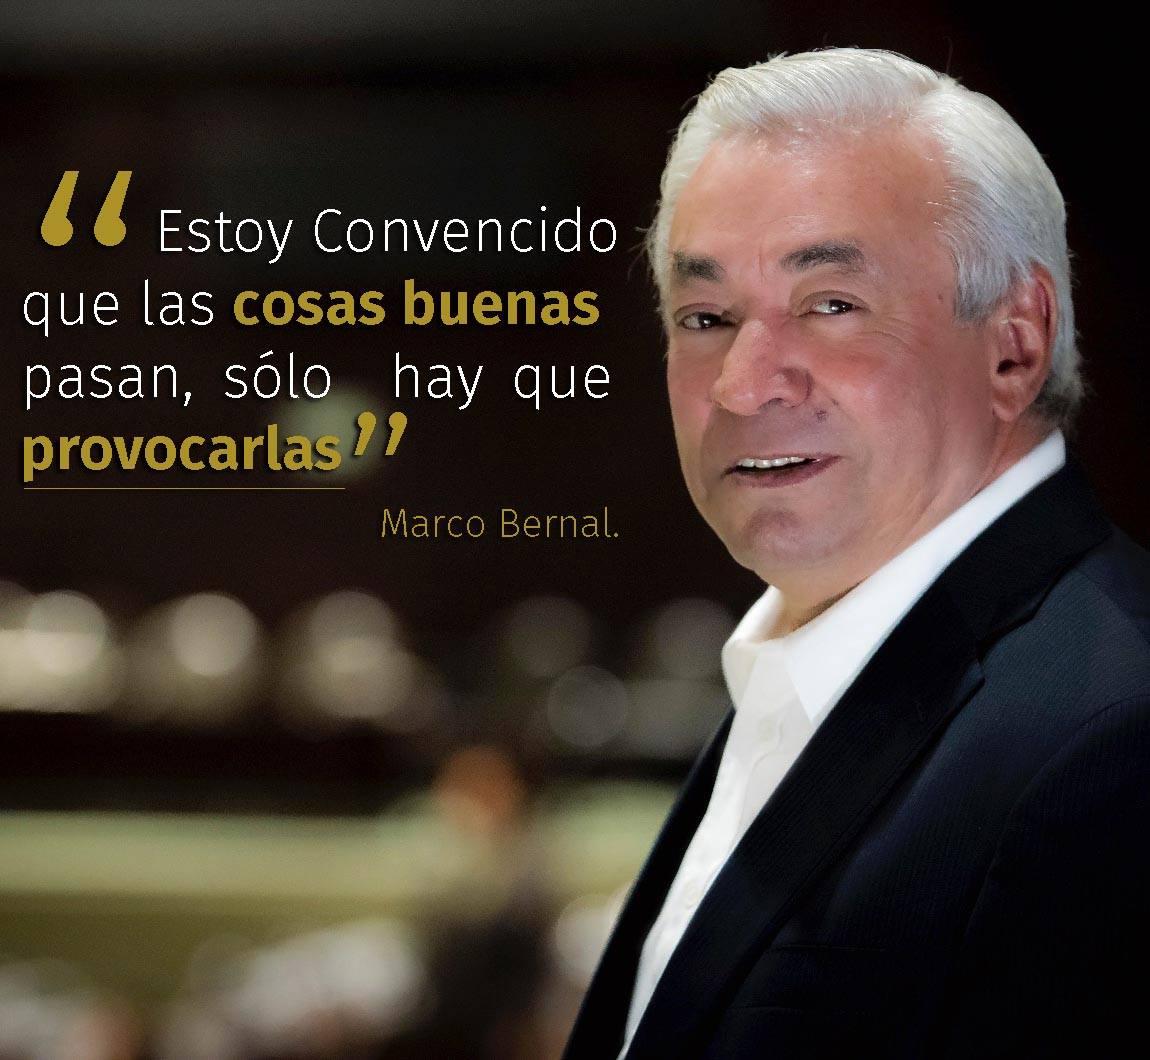 Marco Antonio Bernal on Twitter: \